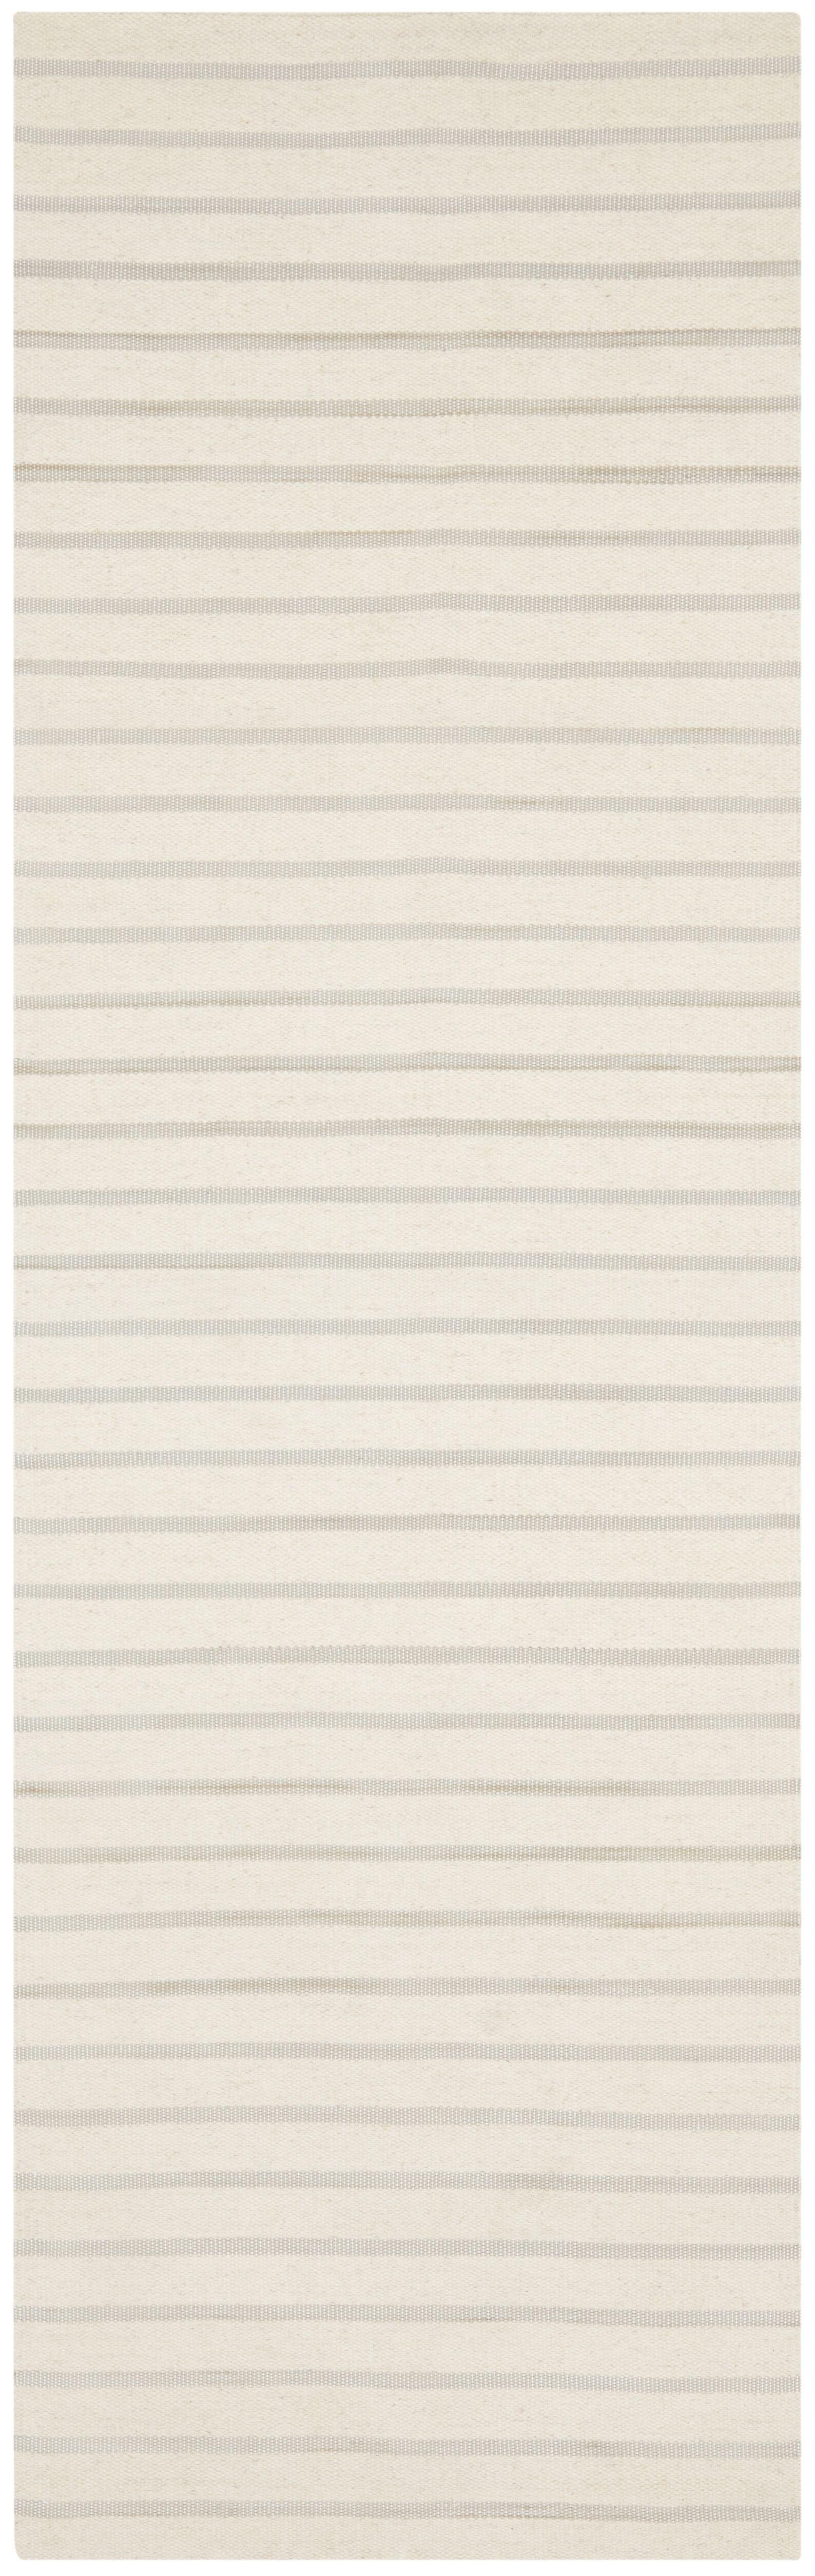 Dhurries Hand-Woven White Area Rug Rug Size: Runner 2'6